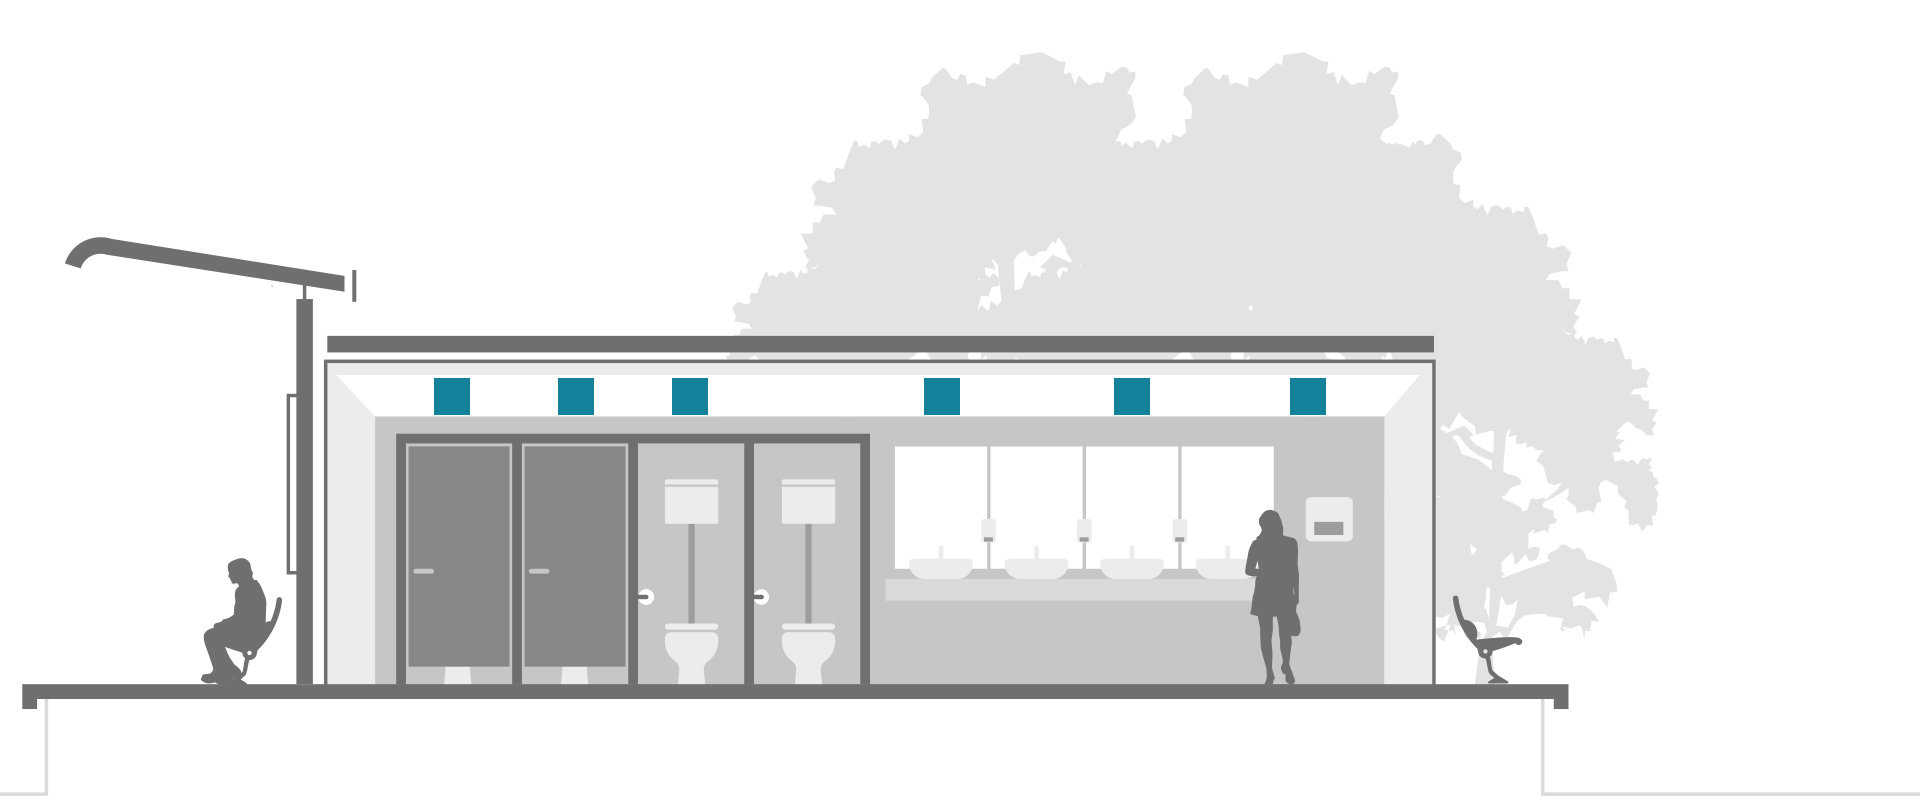 Transportapplications_public_toilets